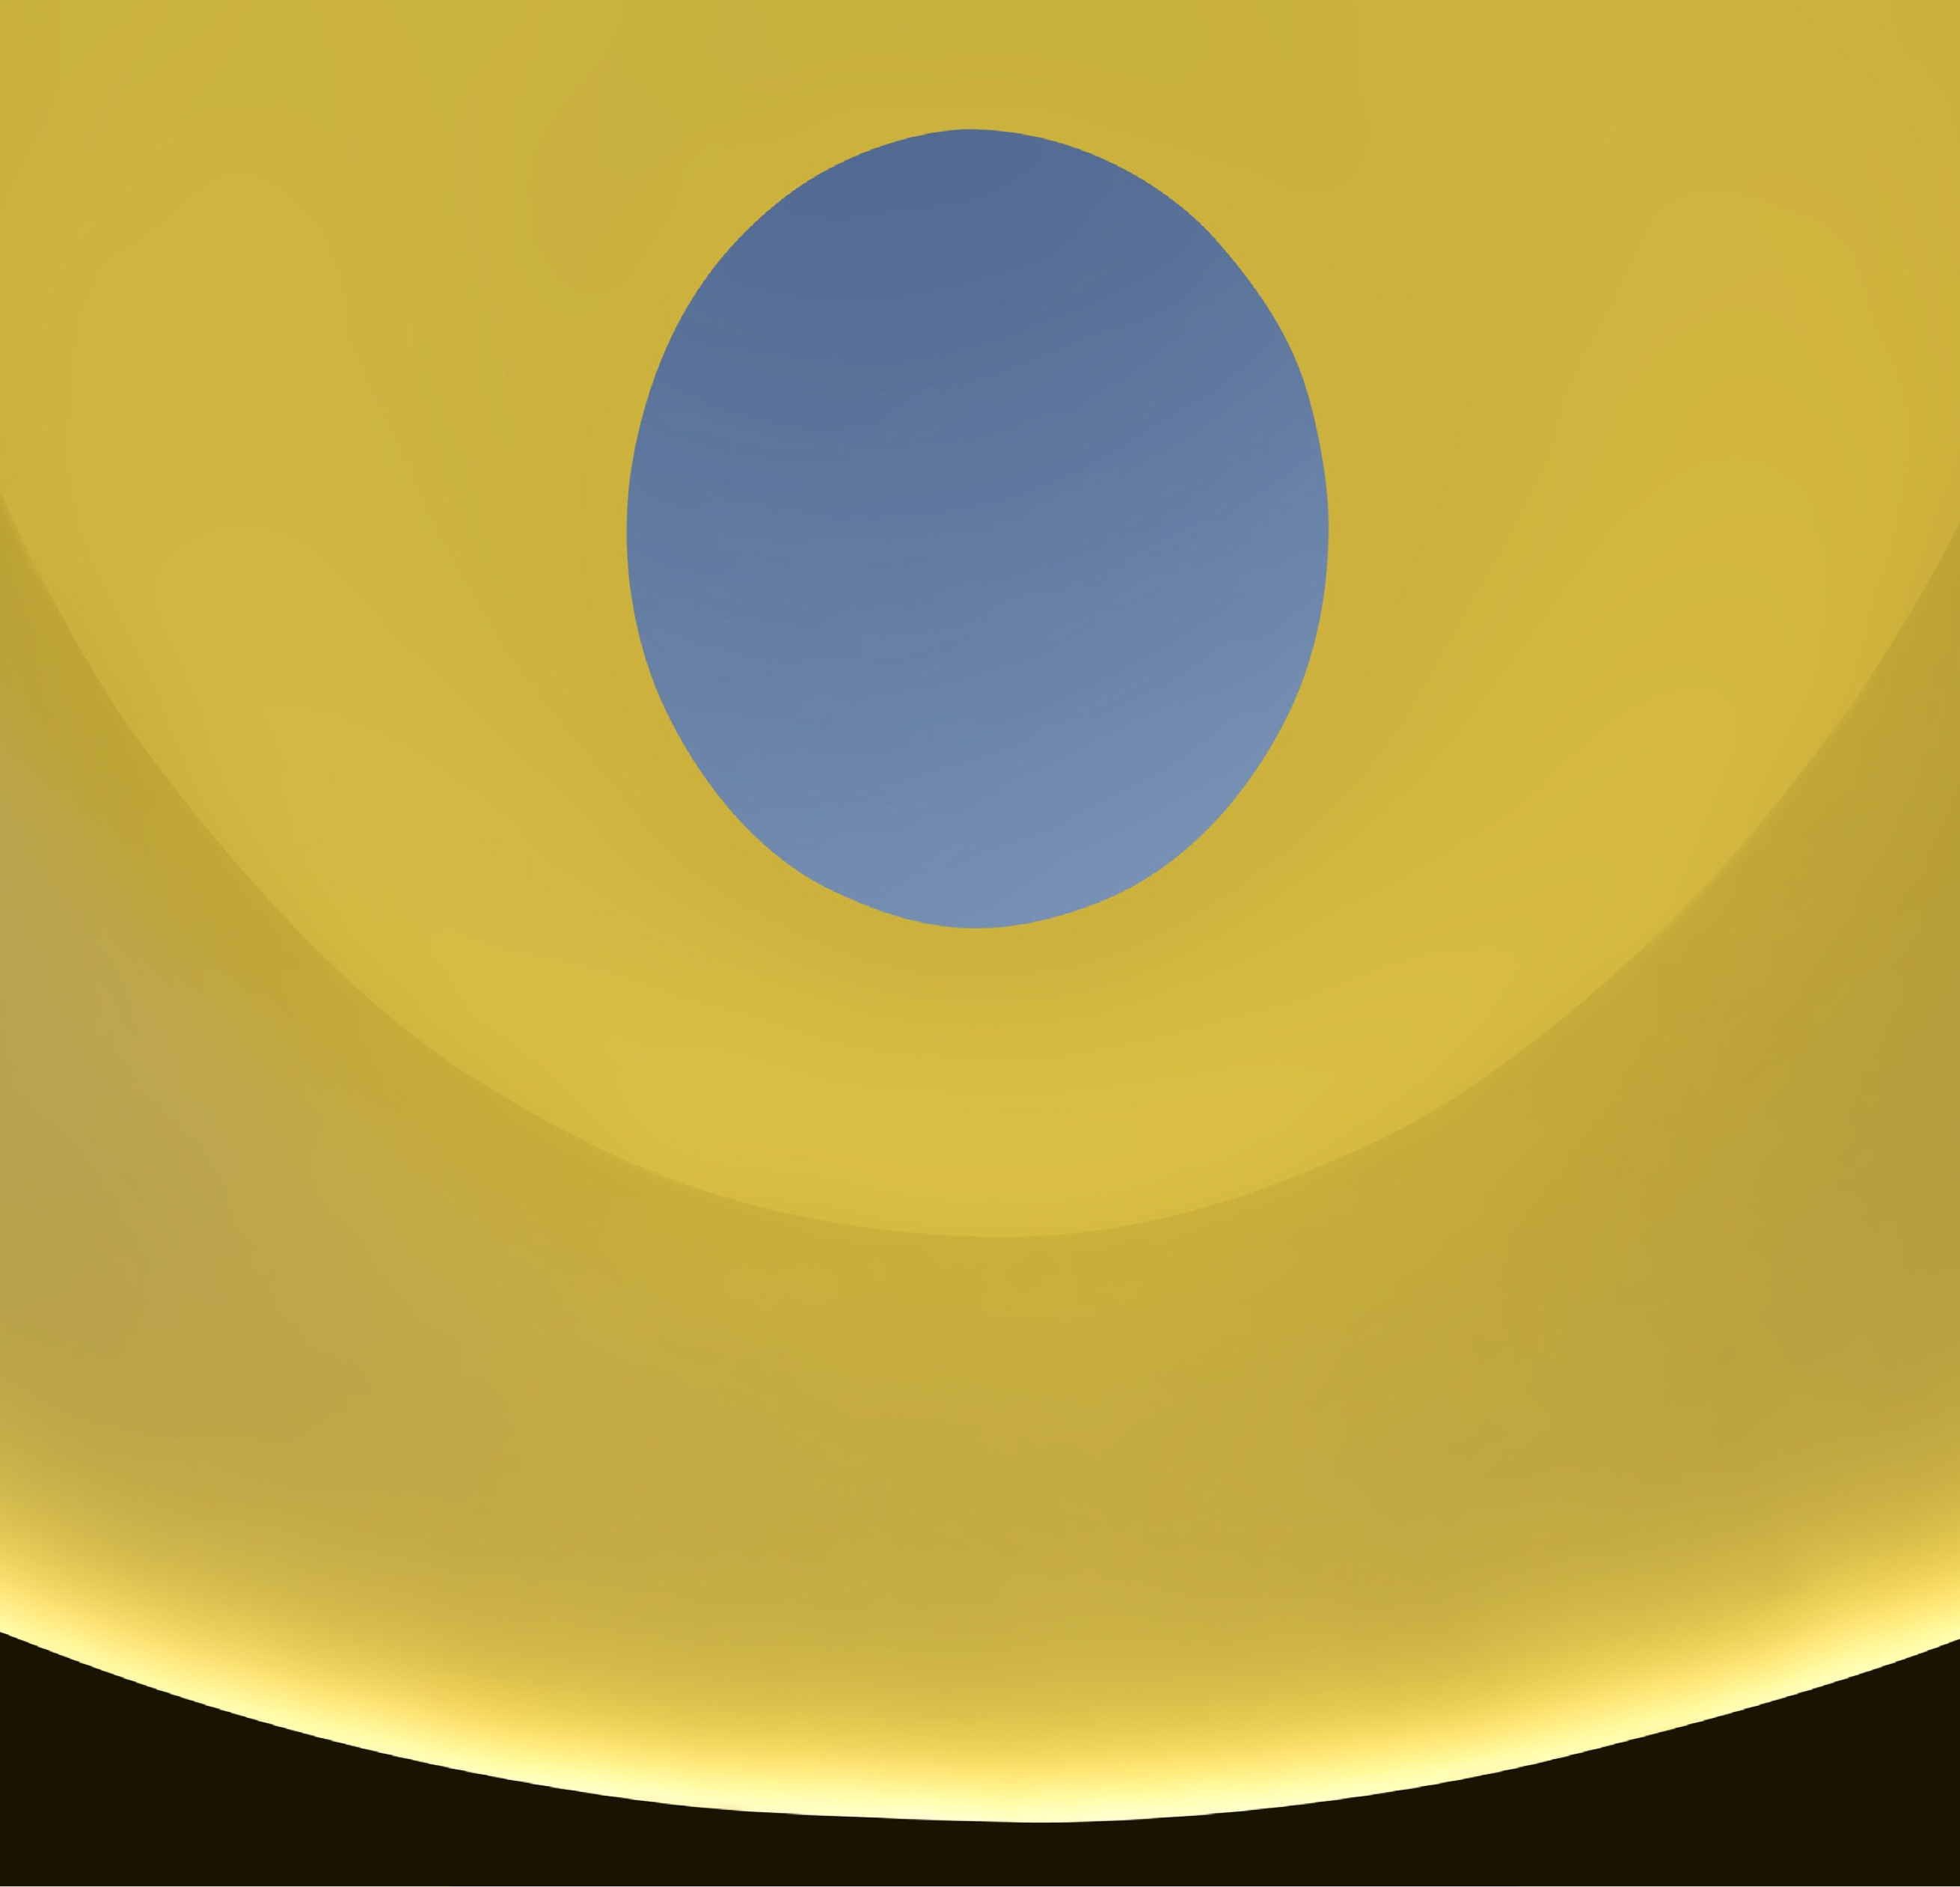 University of Texas Landmarks - Represents skyspacemeditation thumbnail2